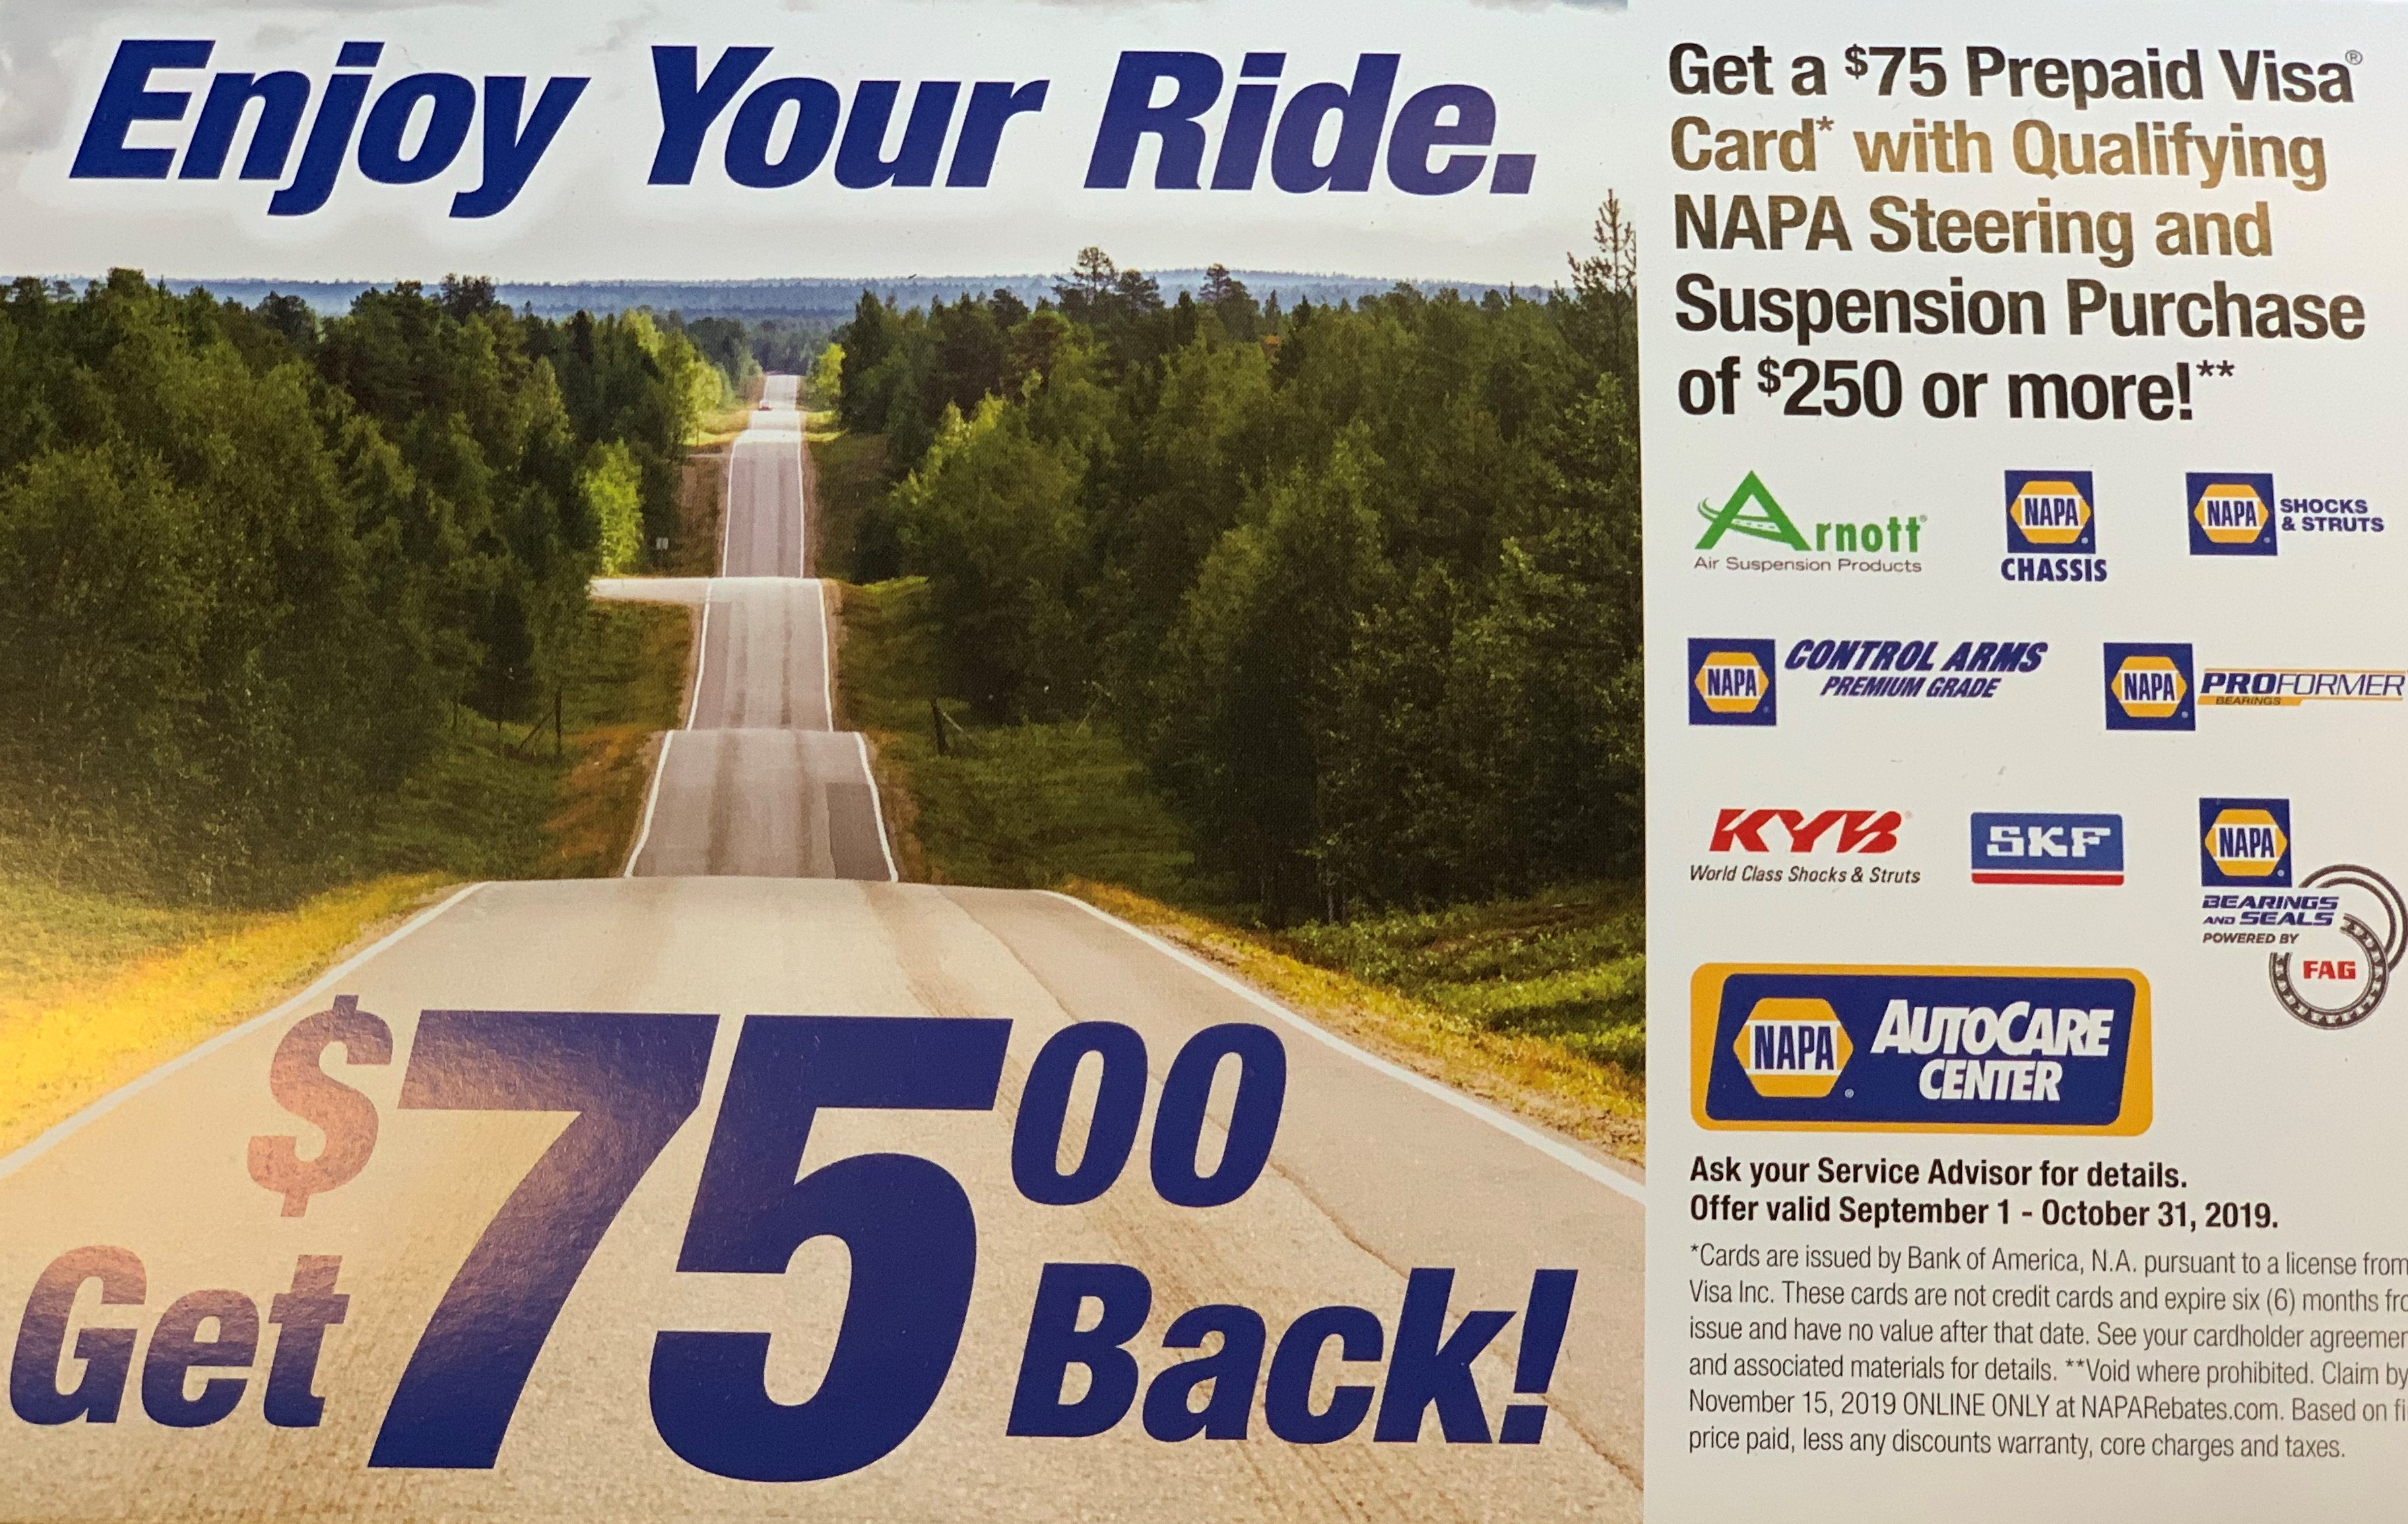 NAPA REBATE: Get $75 Prepaid Visa Card w/ Qualifying NAPA Steering and Suspension Purchase Of $250+